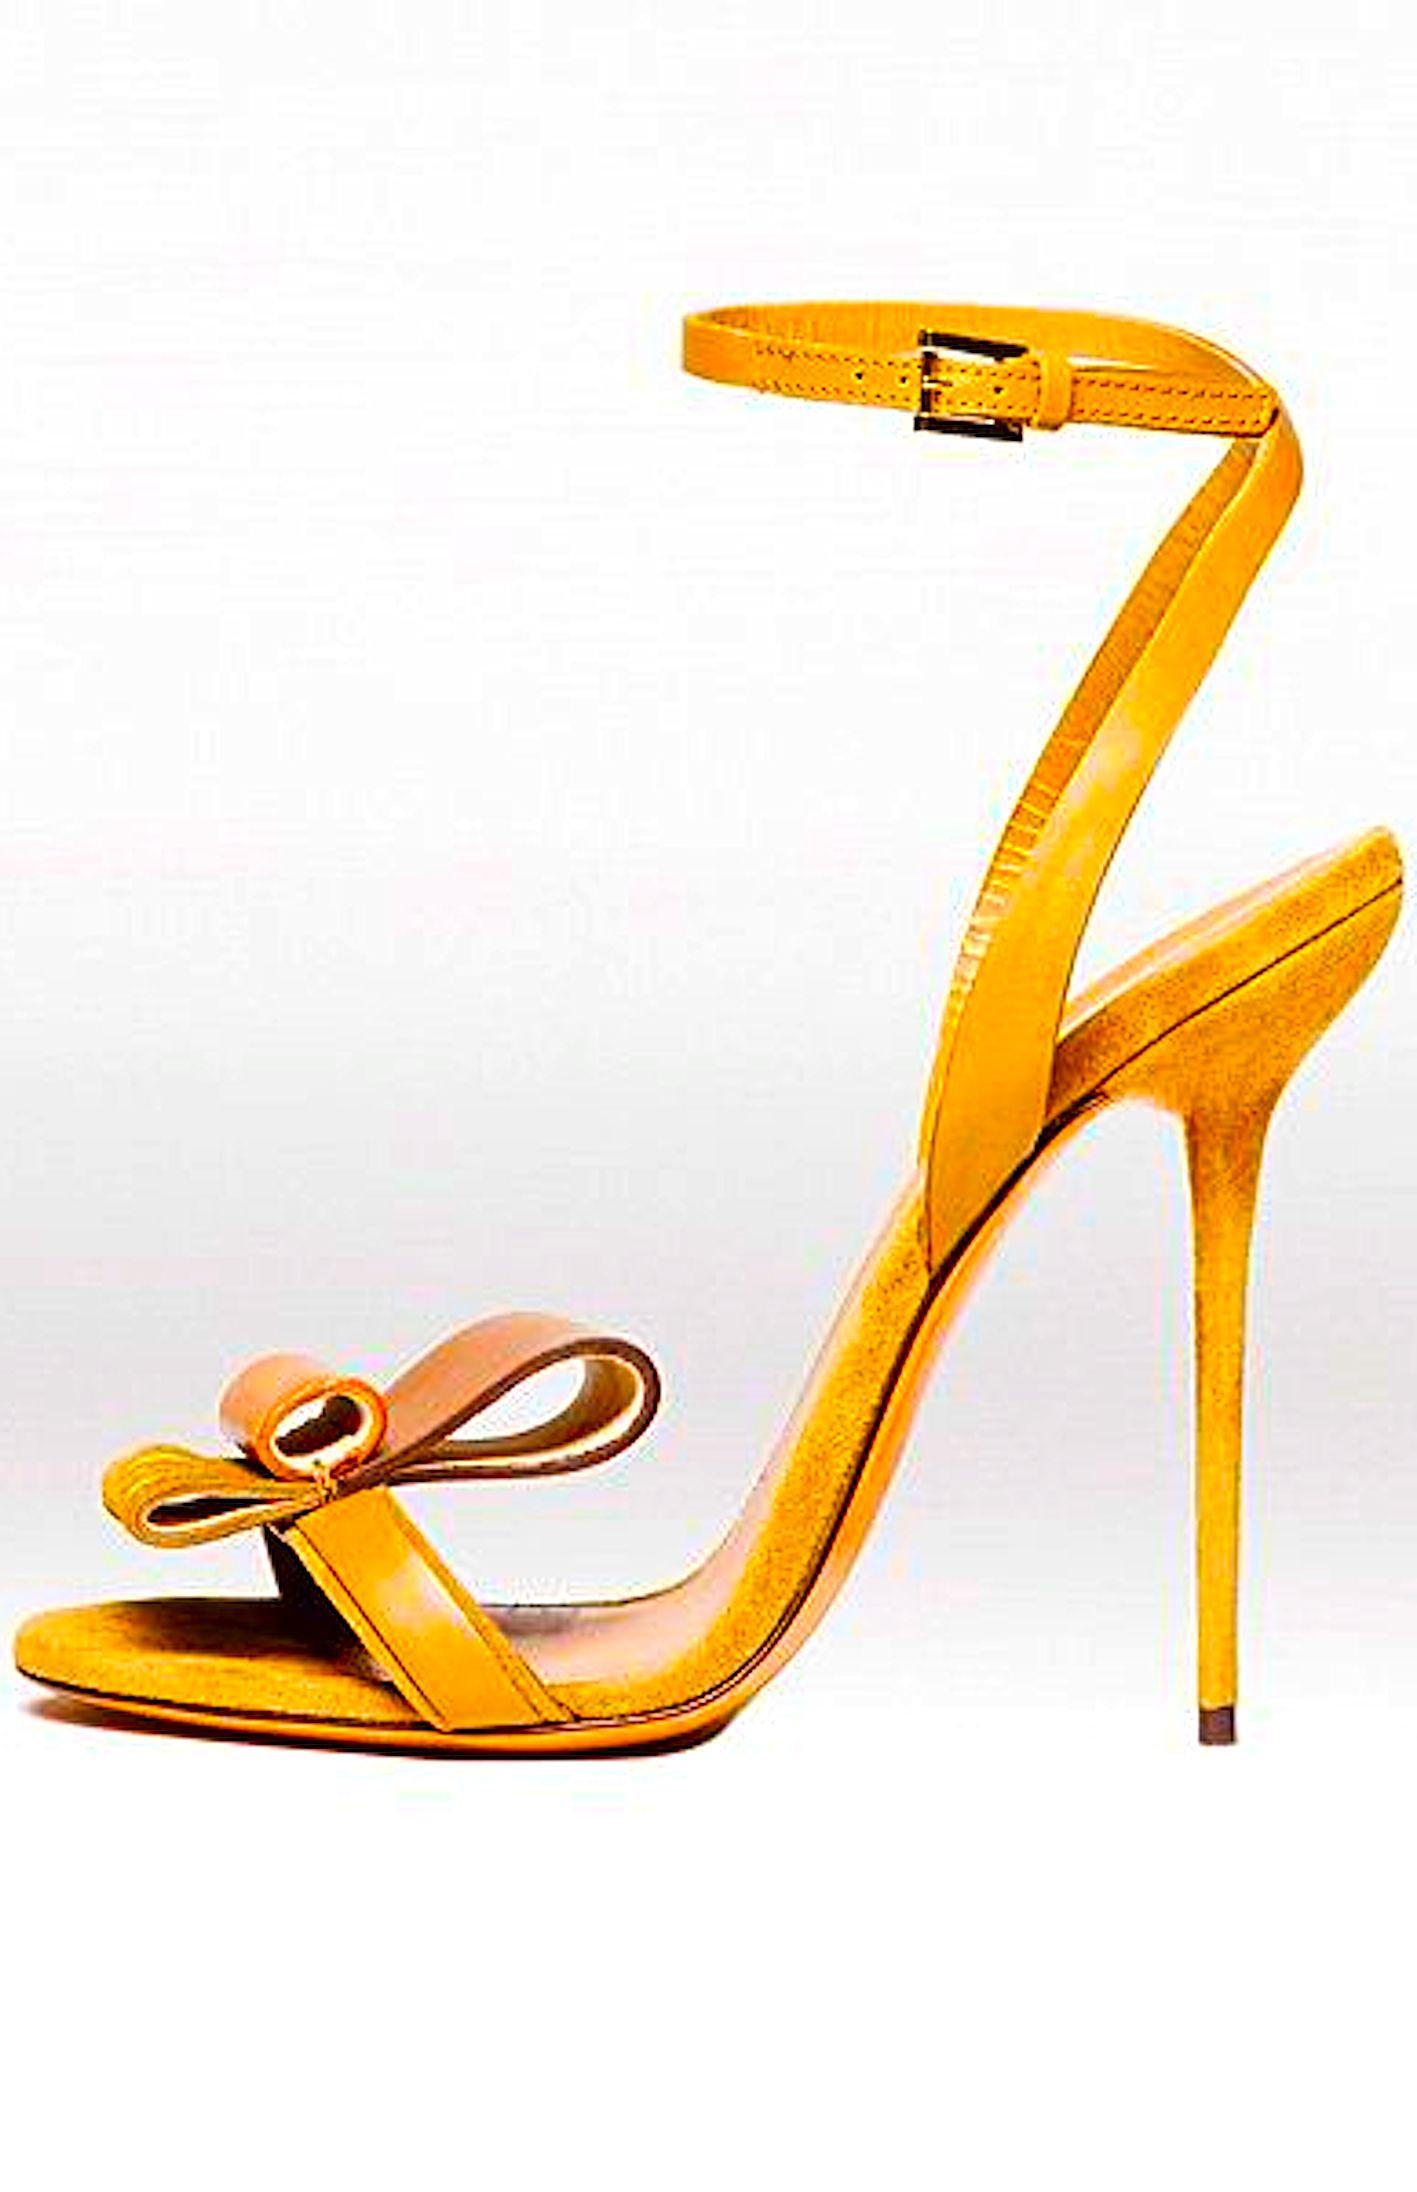 d7f06c82e859 ... feet to wear open shoes. Mustard Yellow High Heel Strap Sandal